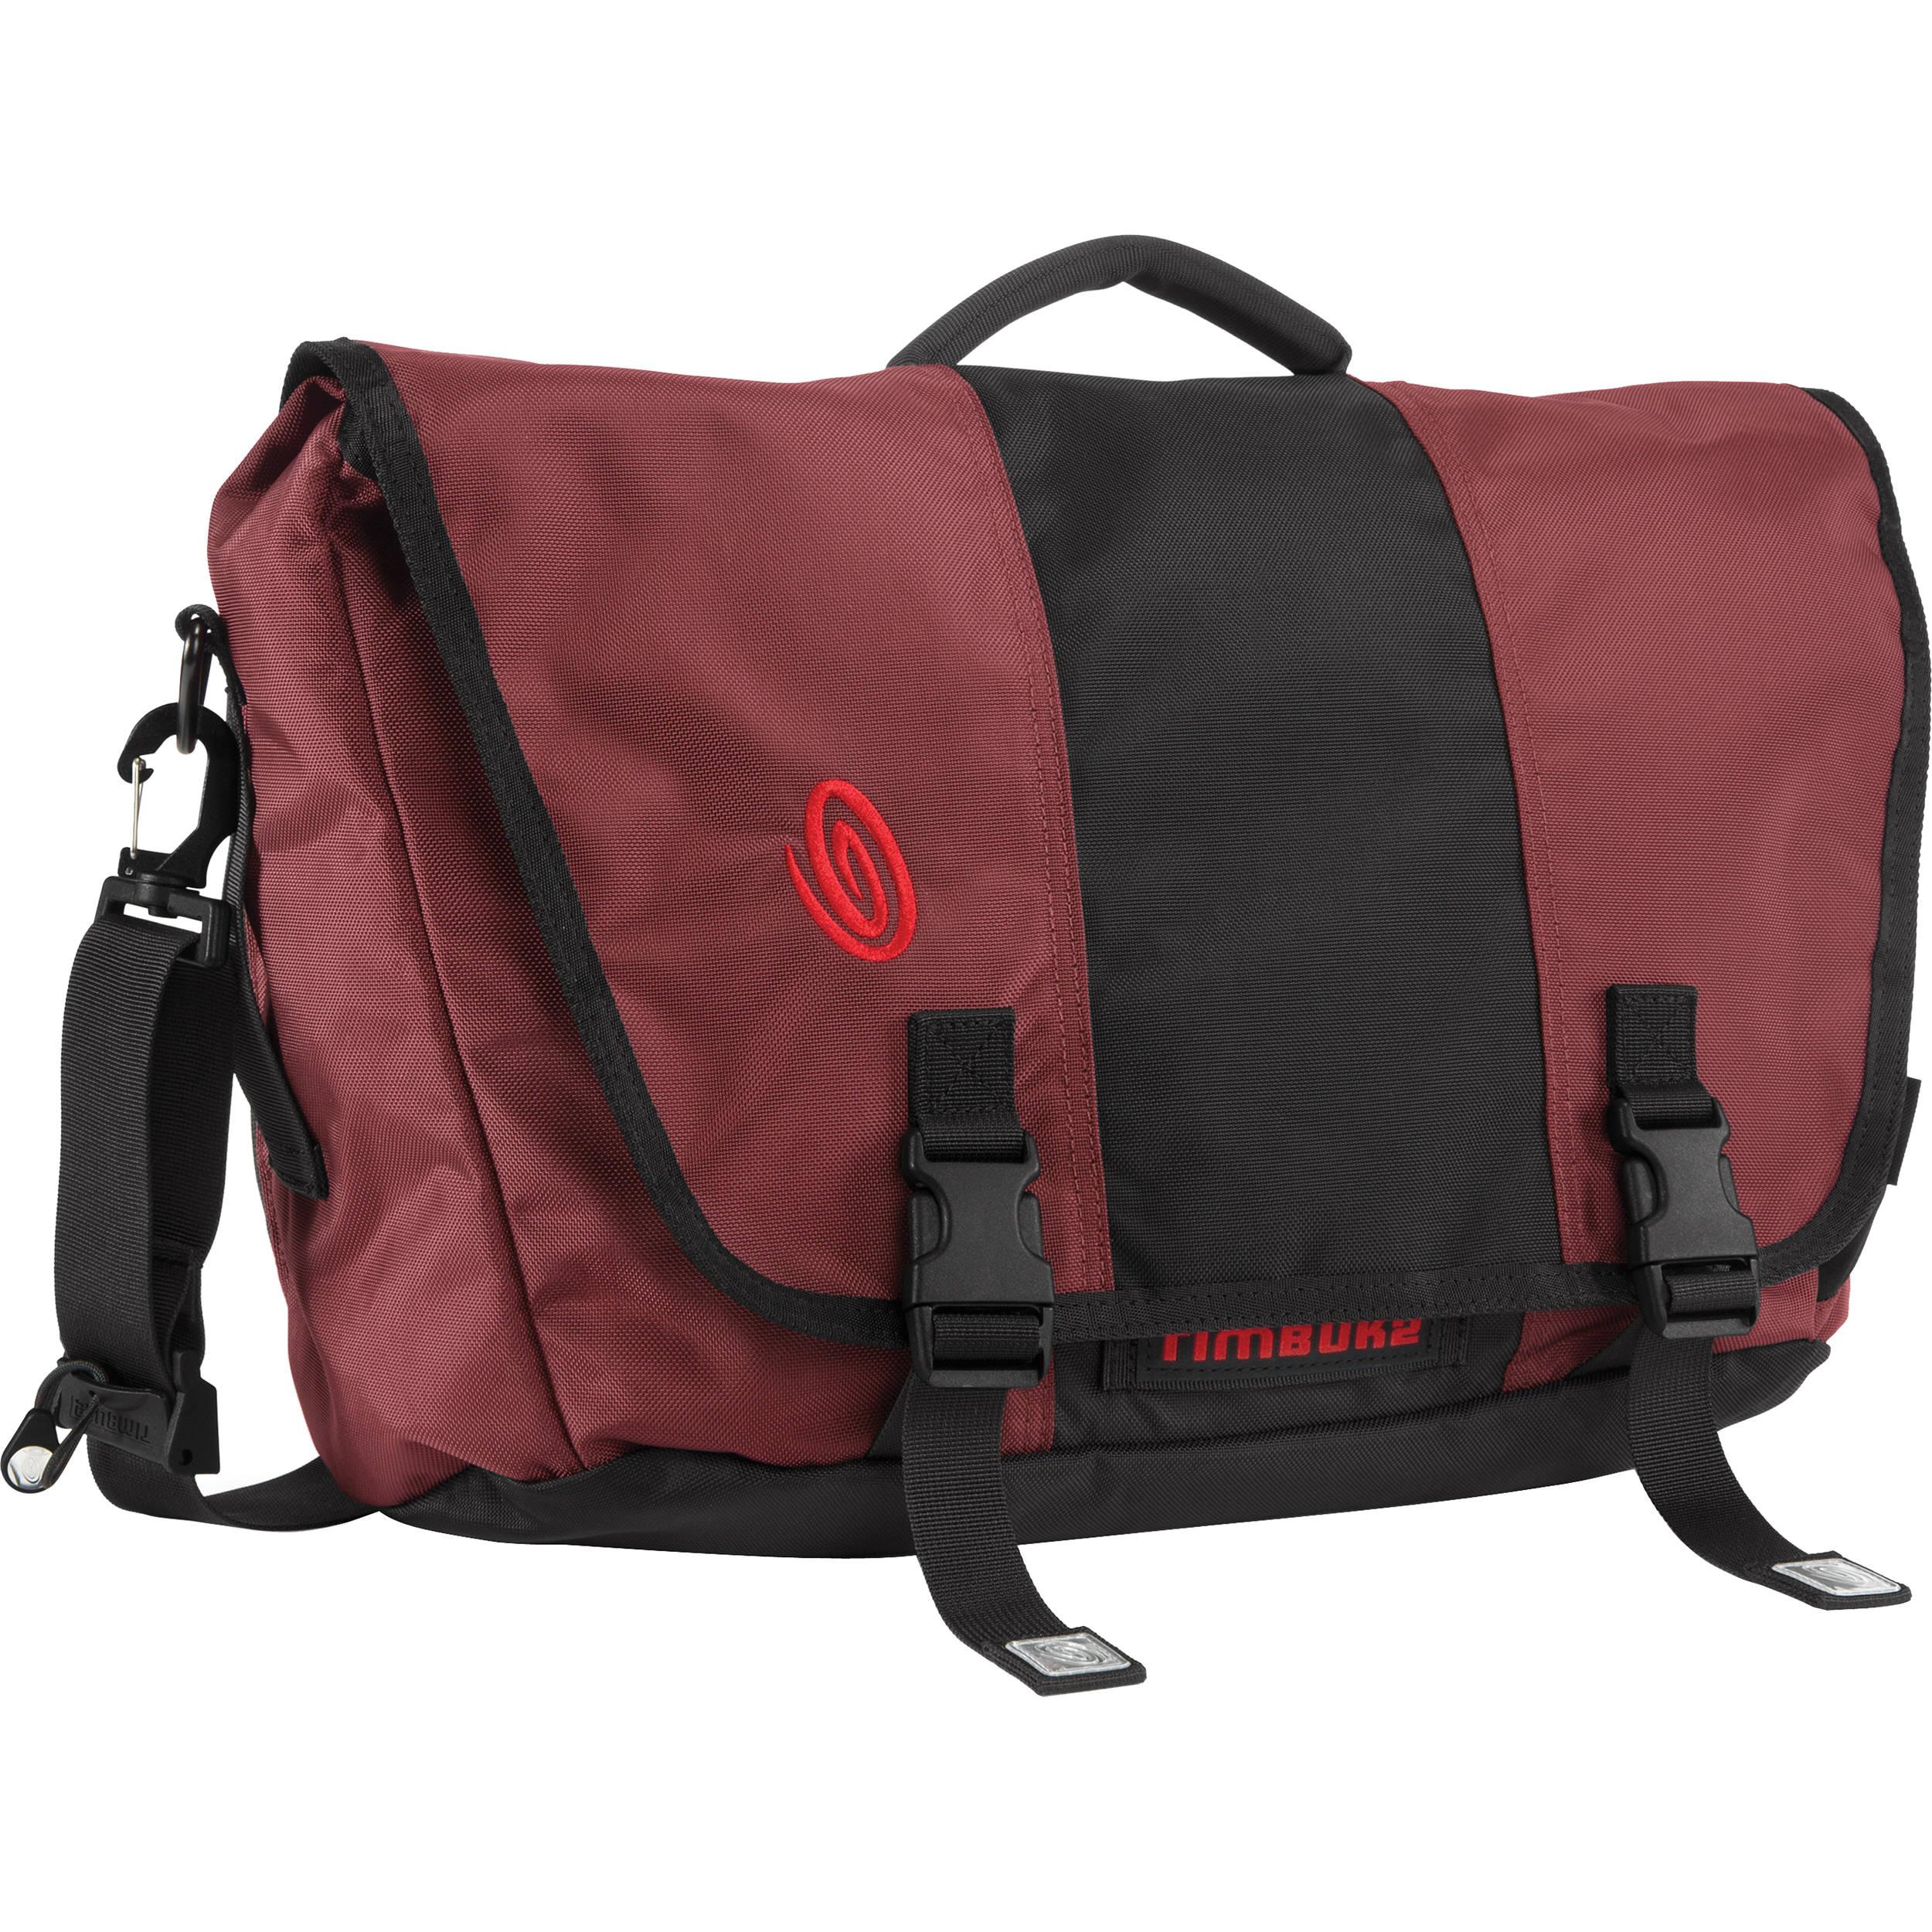 Timbuk2 Commute Laptop Messenger Bag Medium Diablo